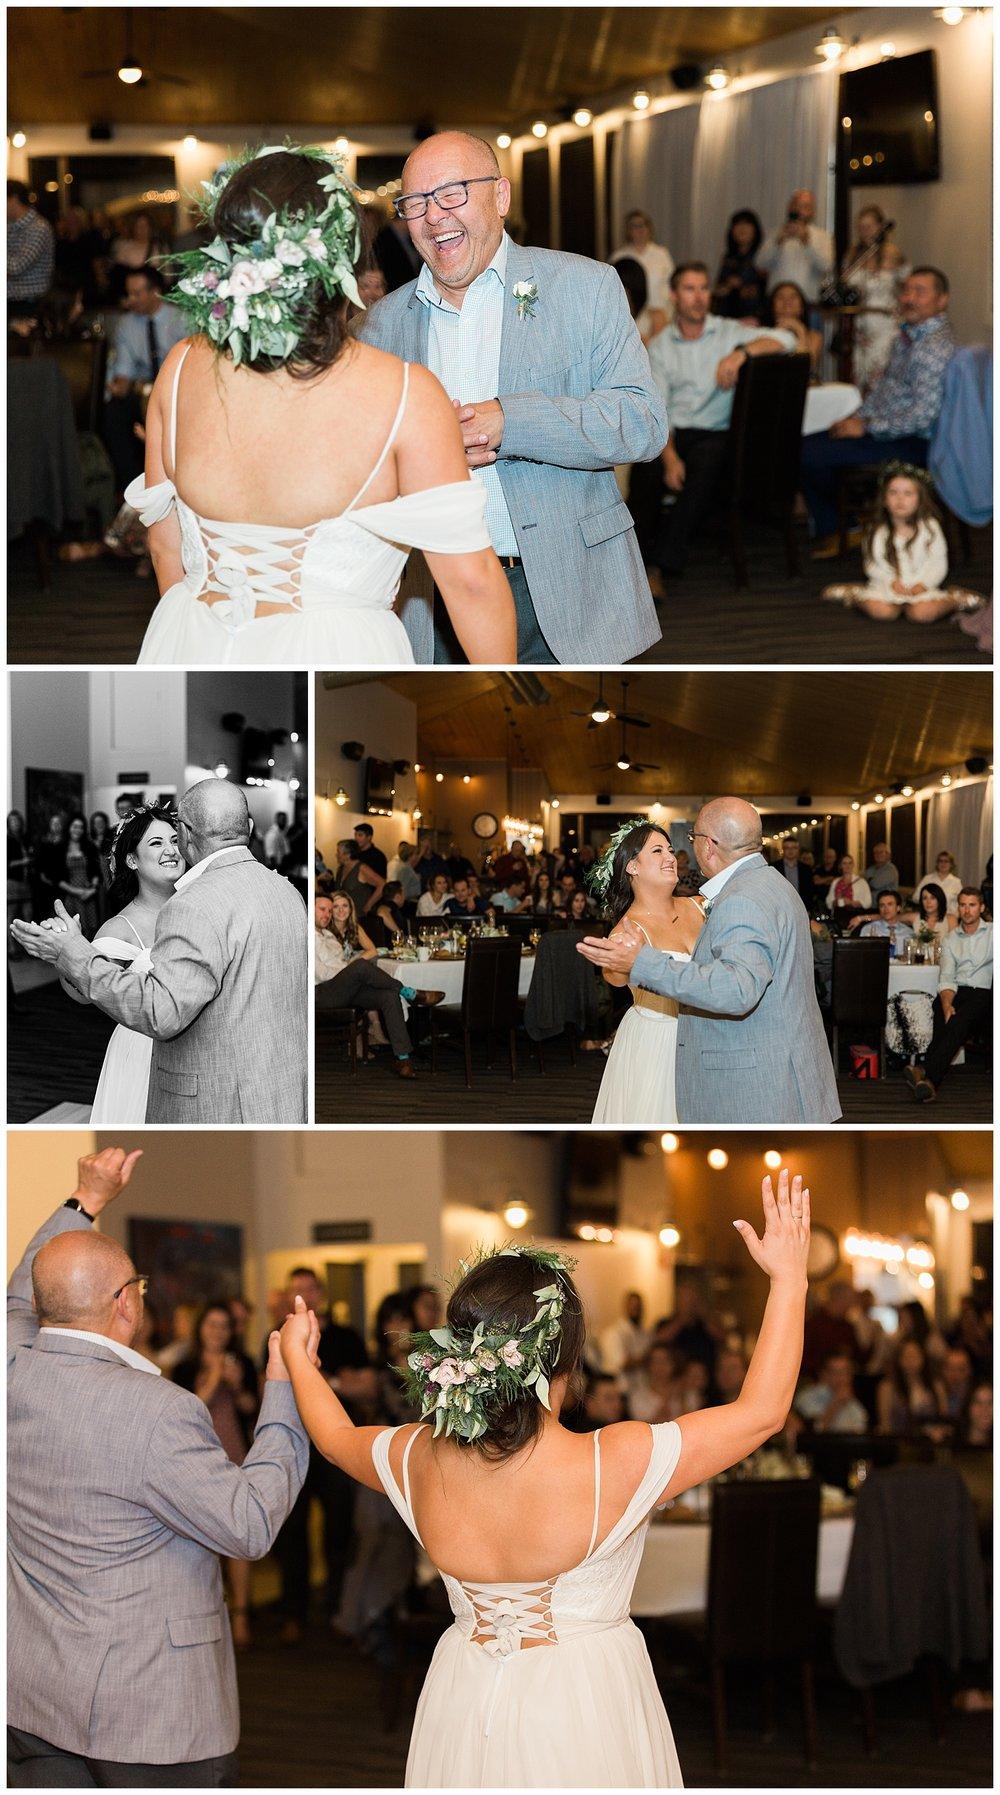 Calgary-wedding-photographer-springbank-links-golf-course-_0028.jpg